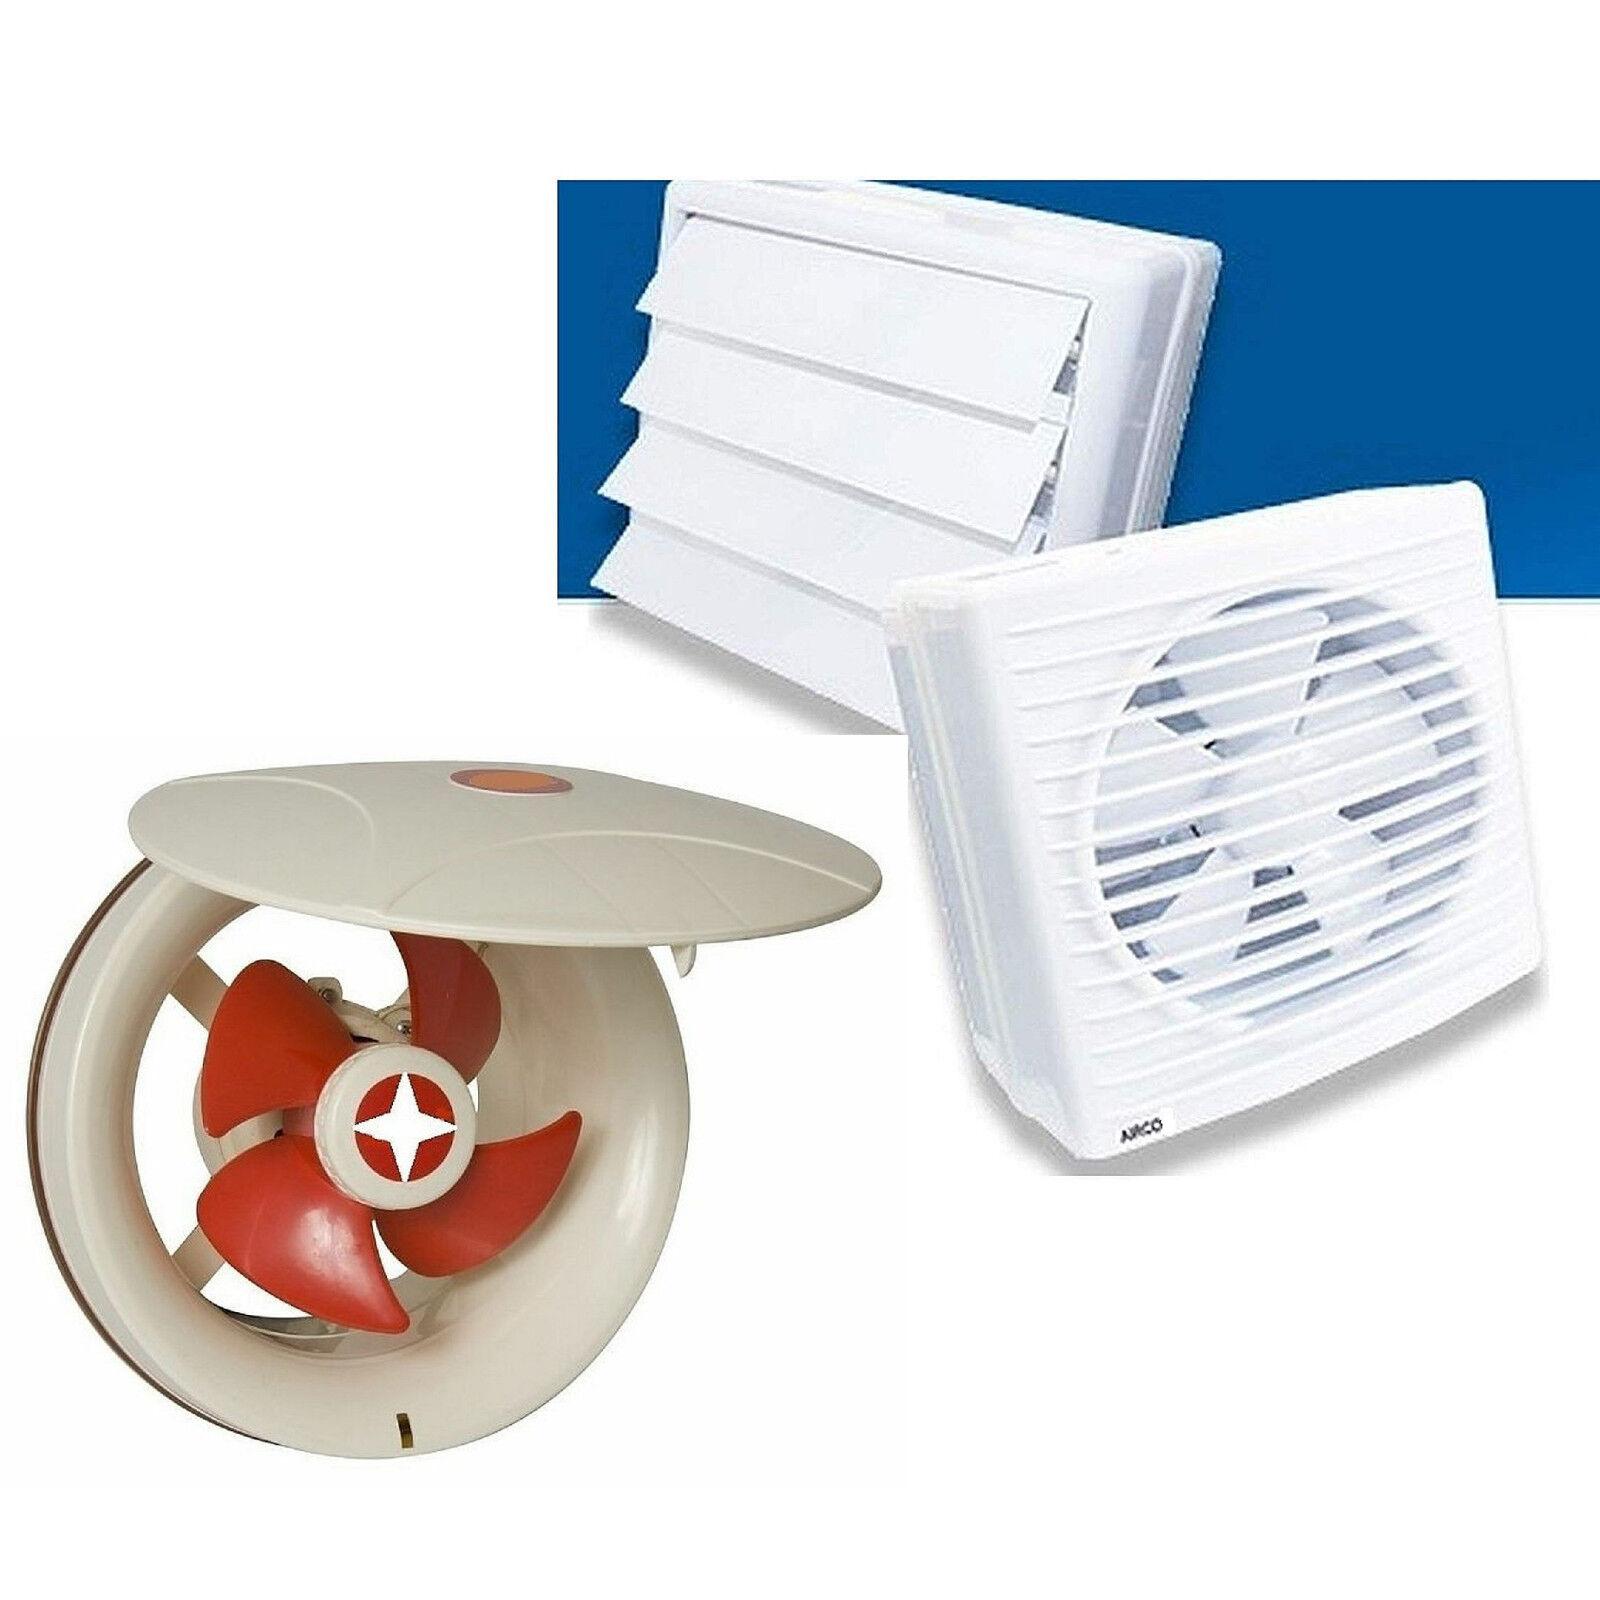 Wandventilator Badventilator  verschlussklappe Bad Wand Lüfter Ventilator          Neu    Exquisite (in) Verarbeitung    Shopping Online